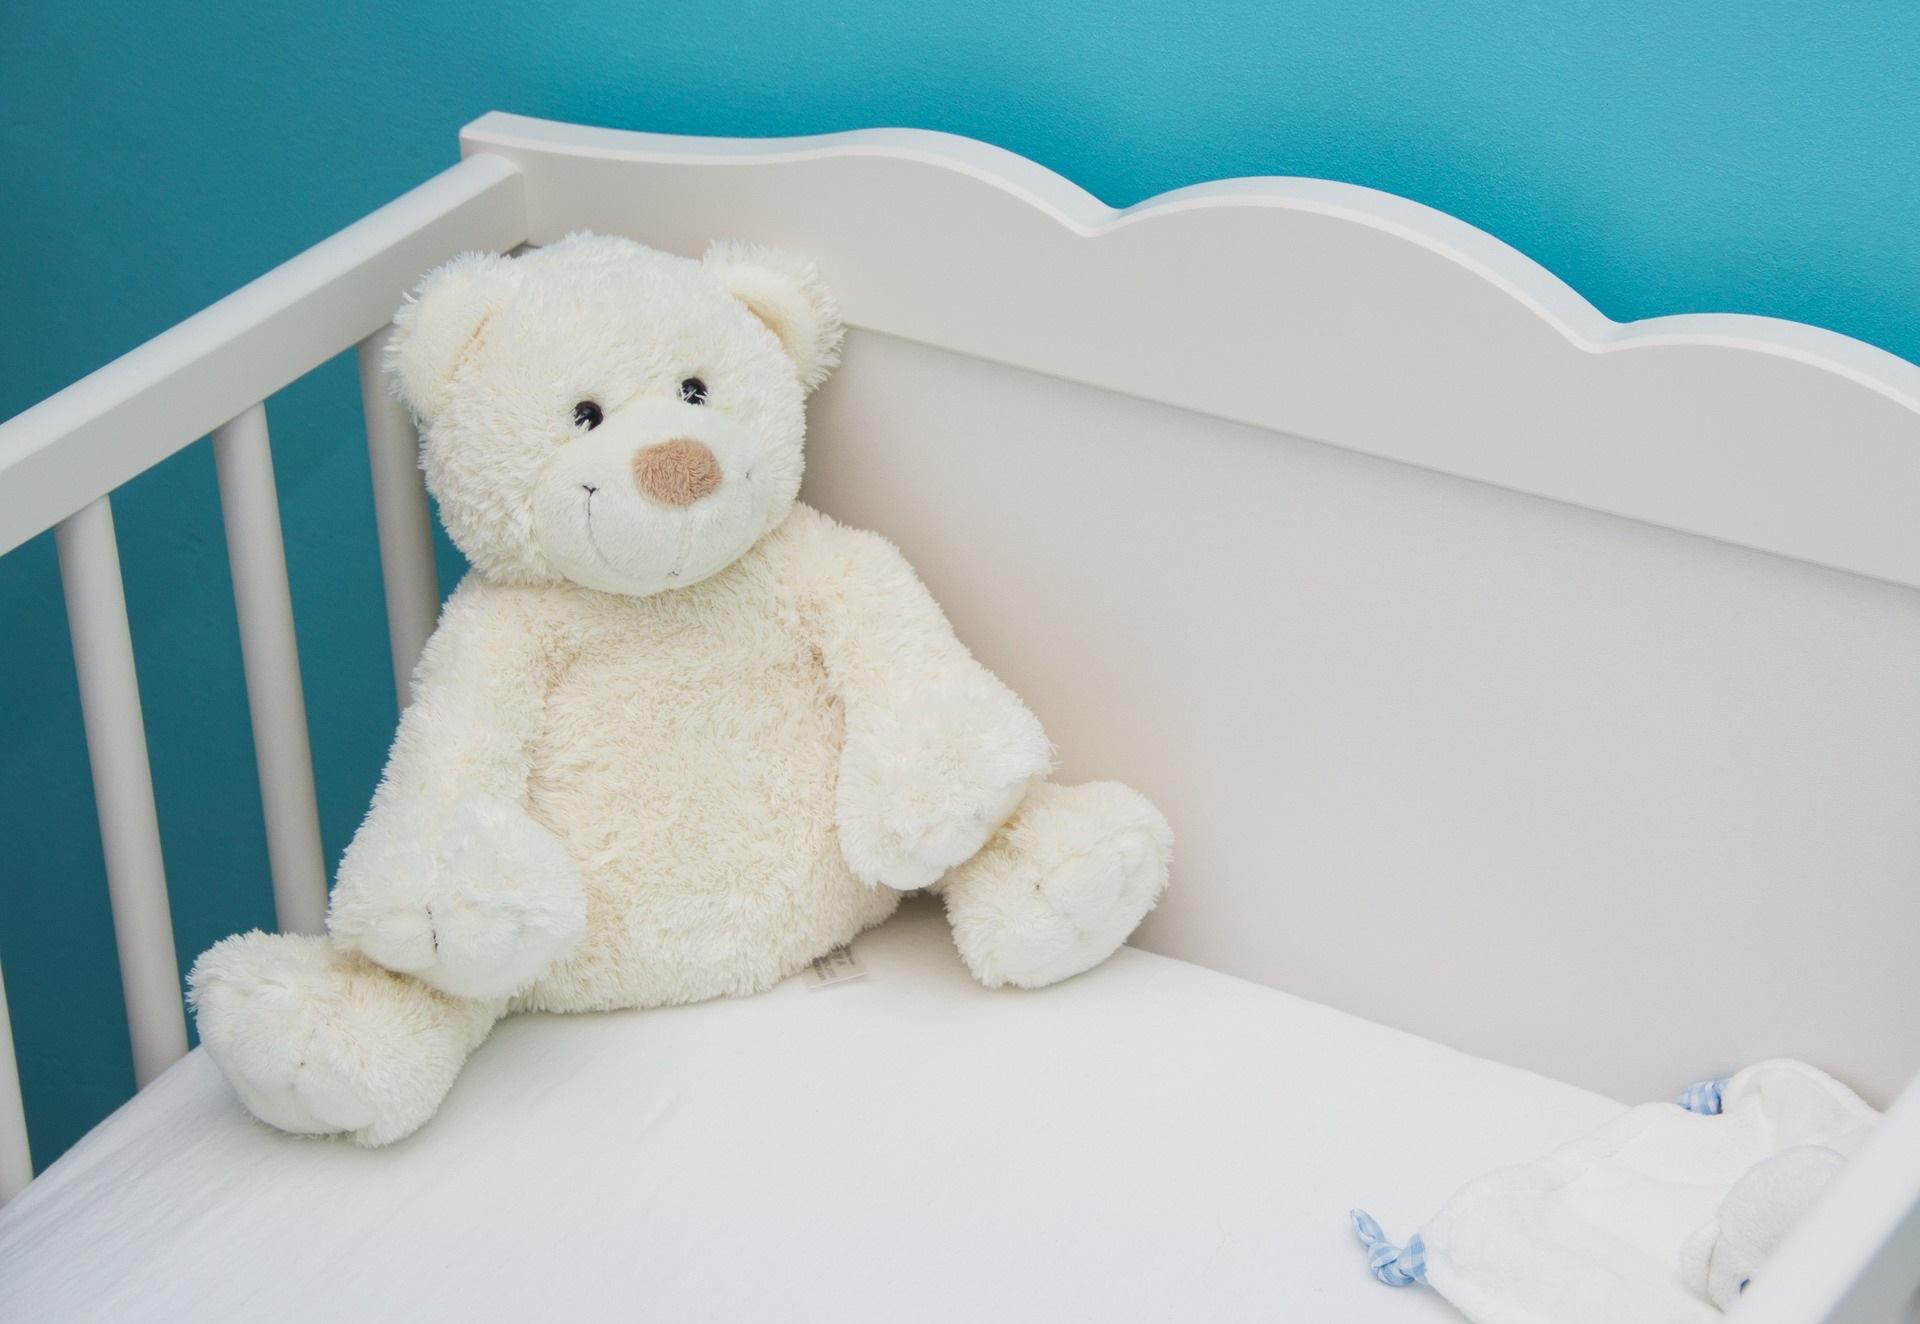 babybett mit teddy